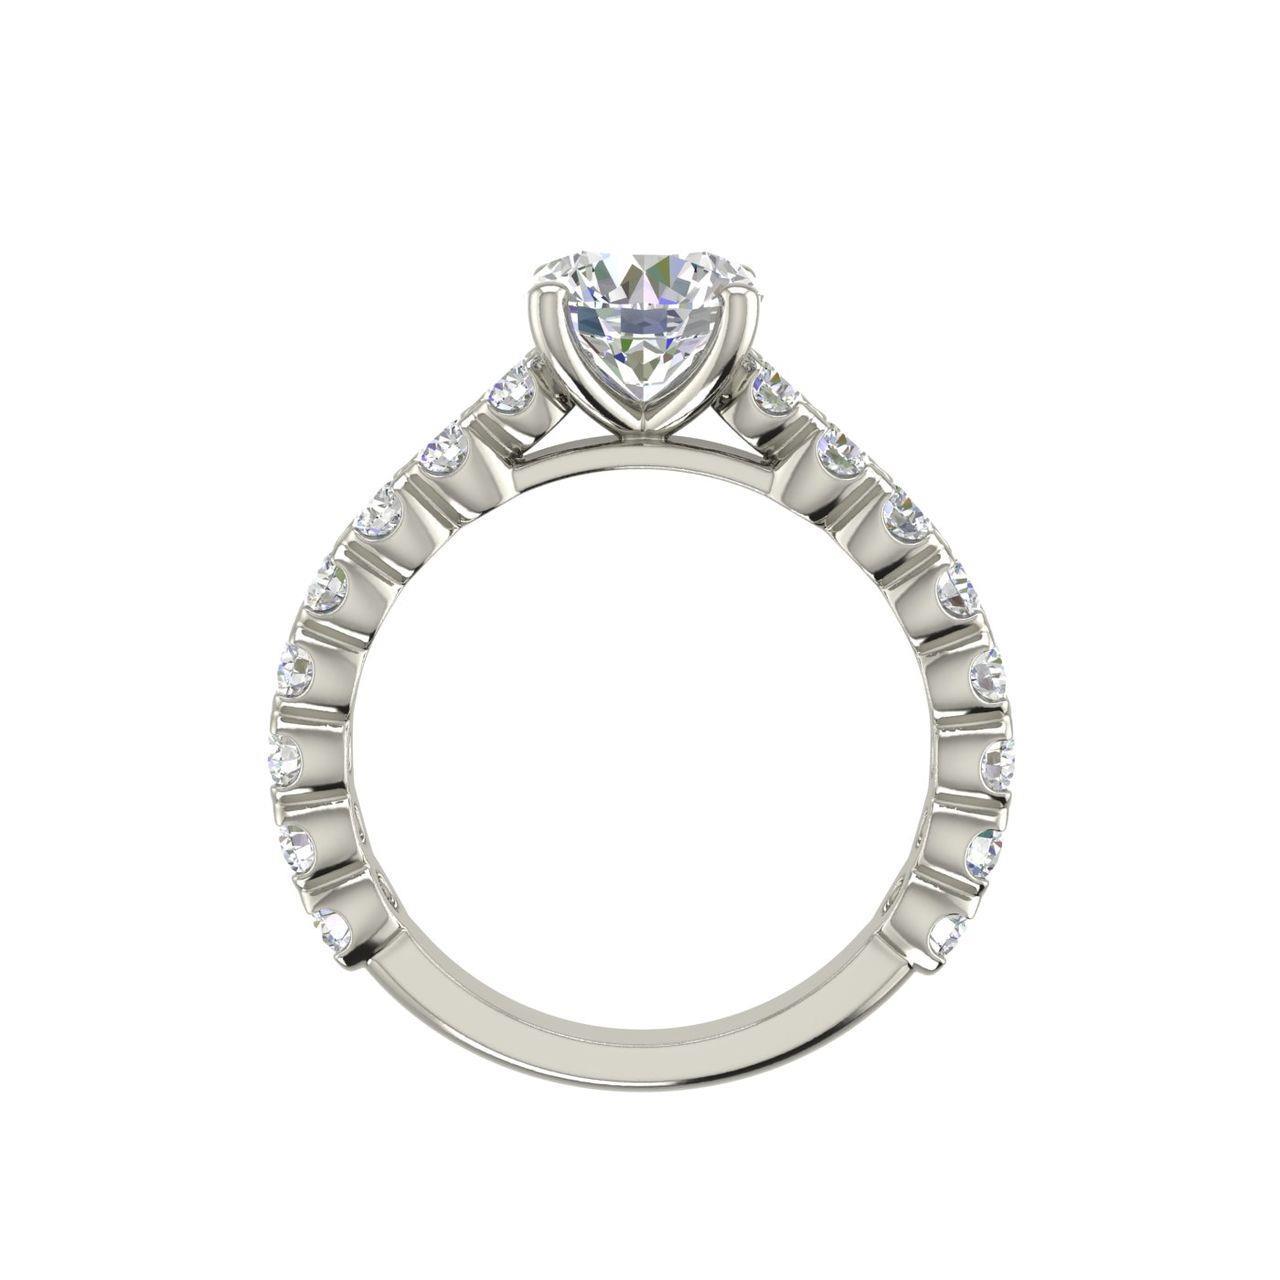 Solitaire 1.2 Carat Round Cut Diamond Engagement Ring